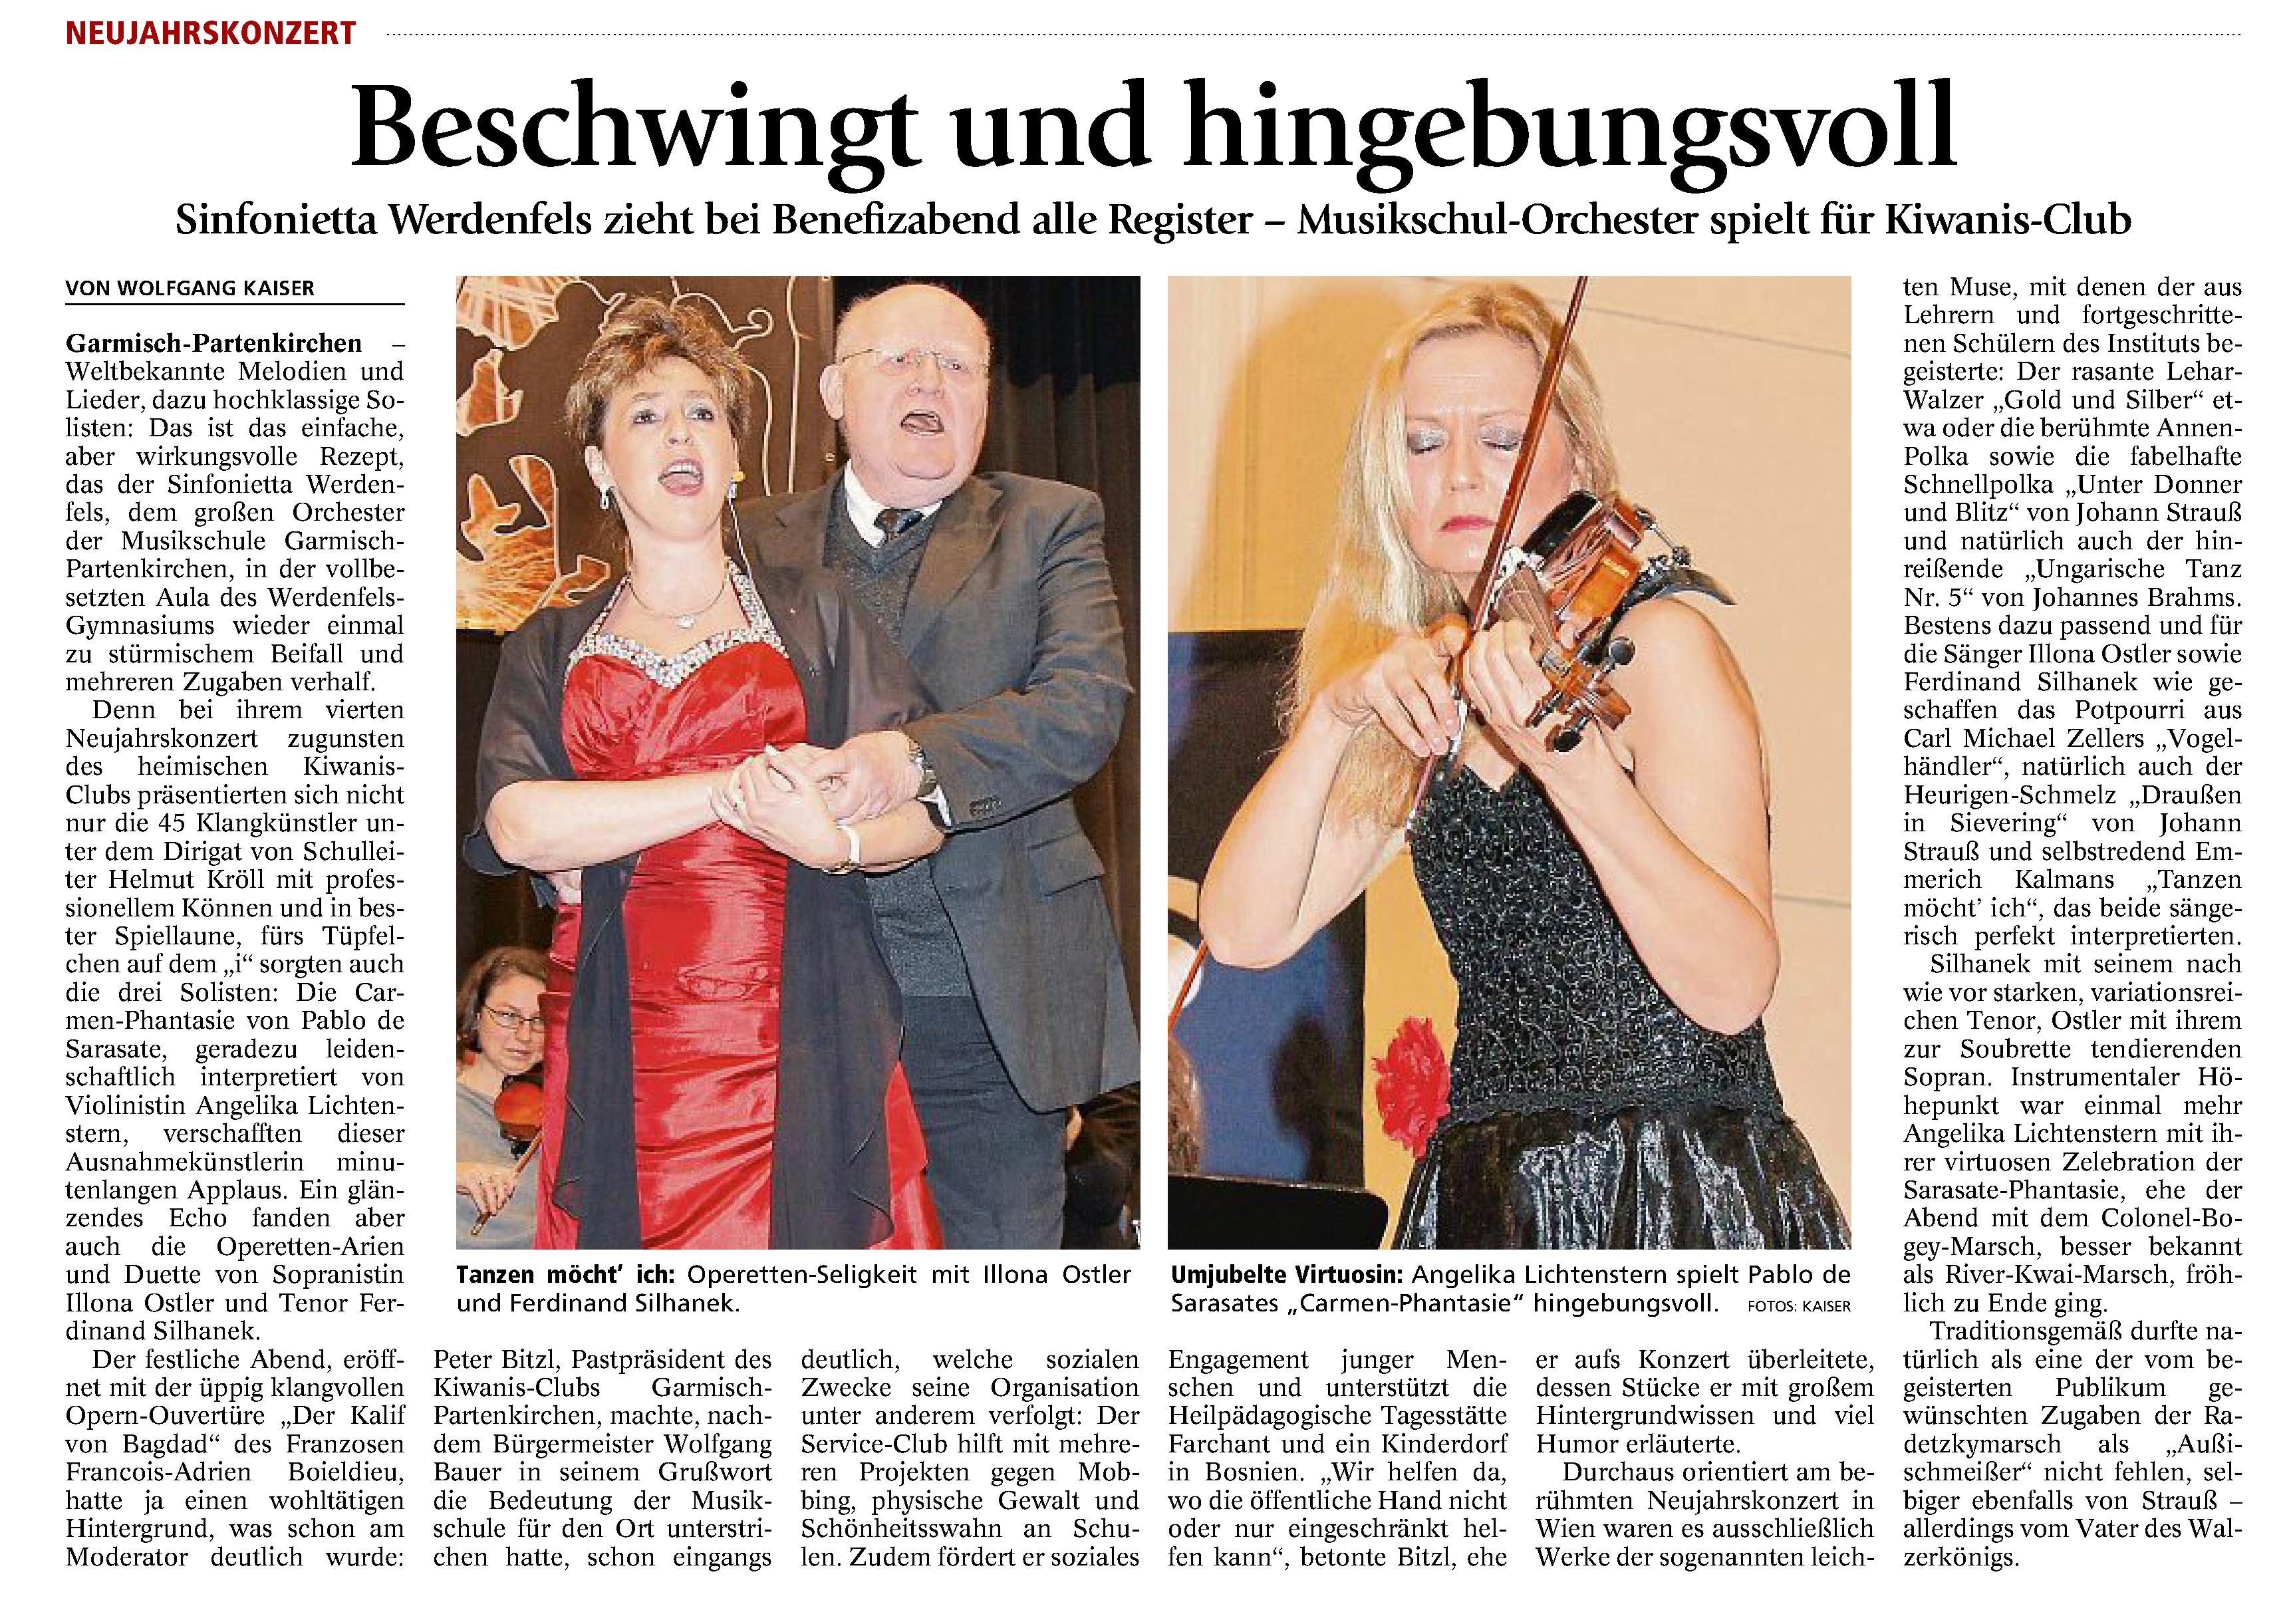 Garmisch-Partenkirchner Tagblatt, 11. Januar 2016